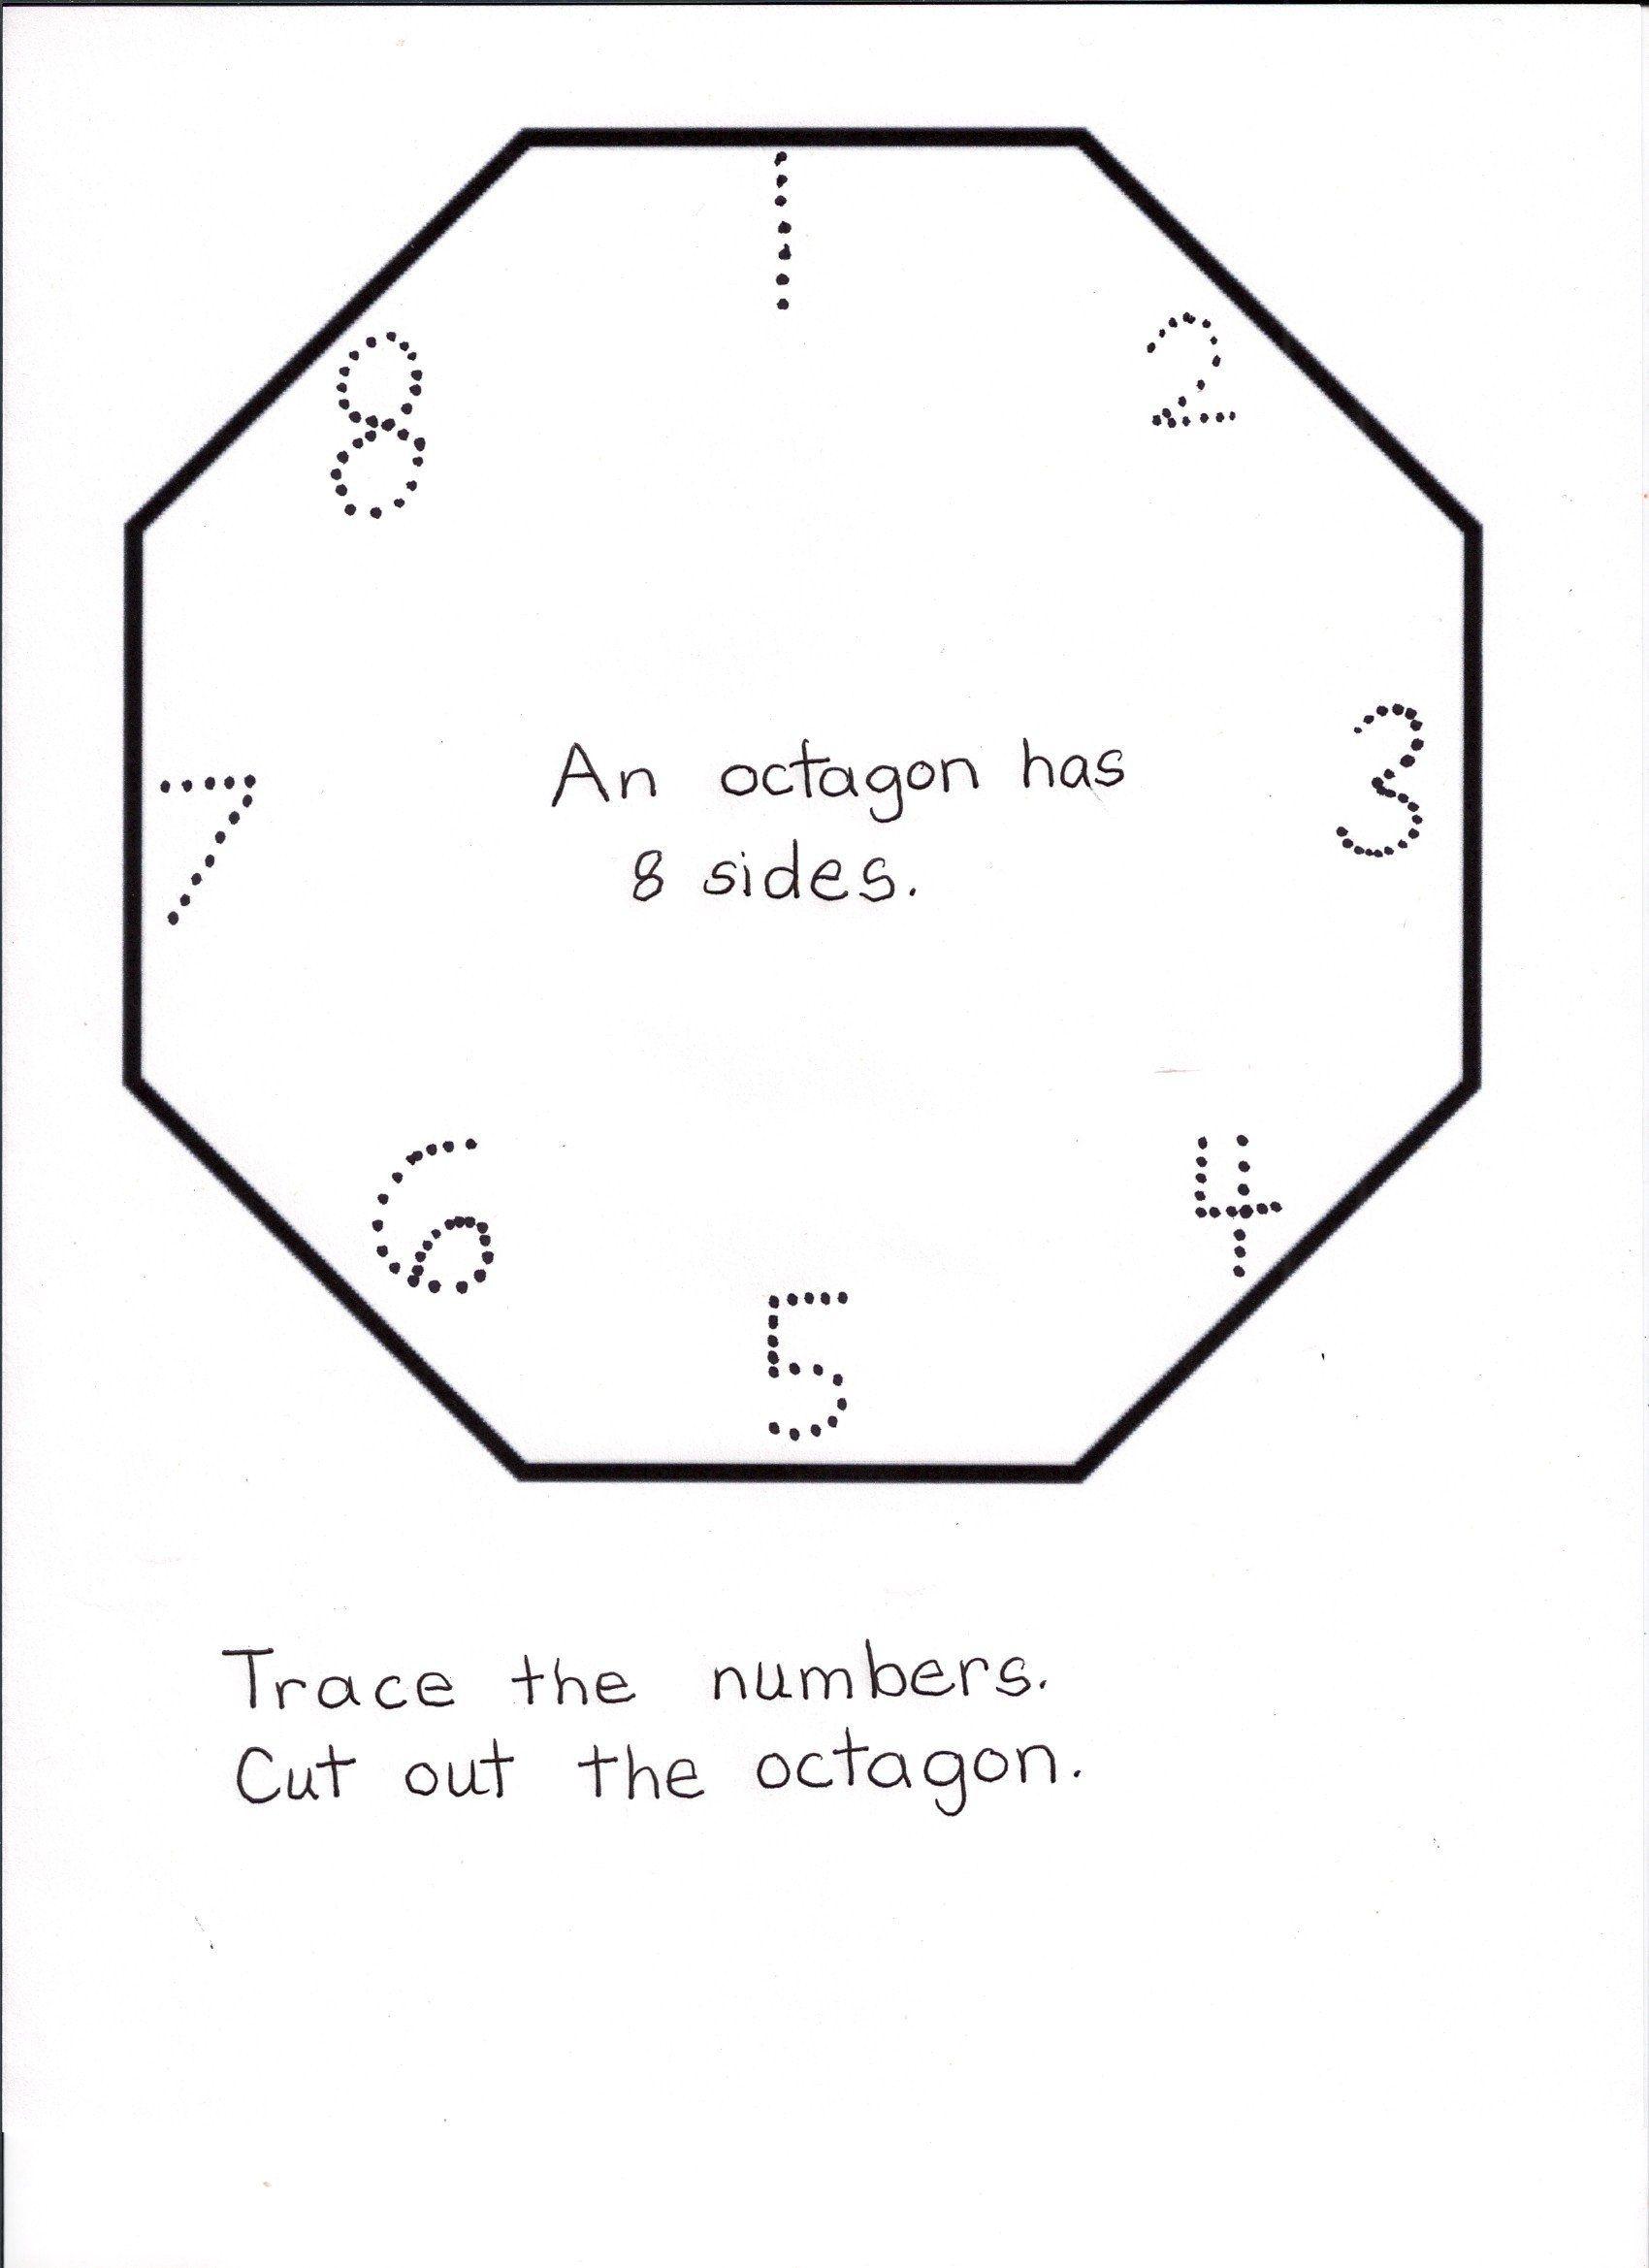 Octagon Worksheets For Preschool Polygon Shapes Worksheets